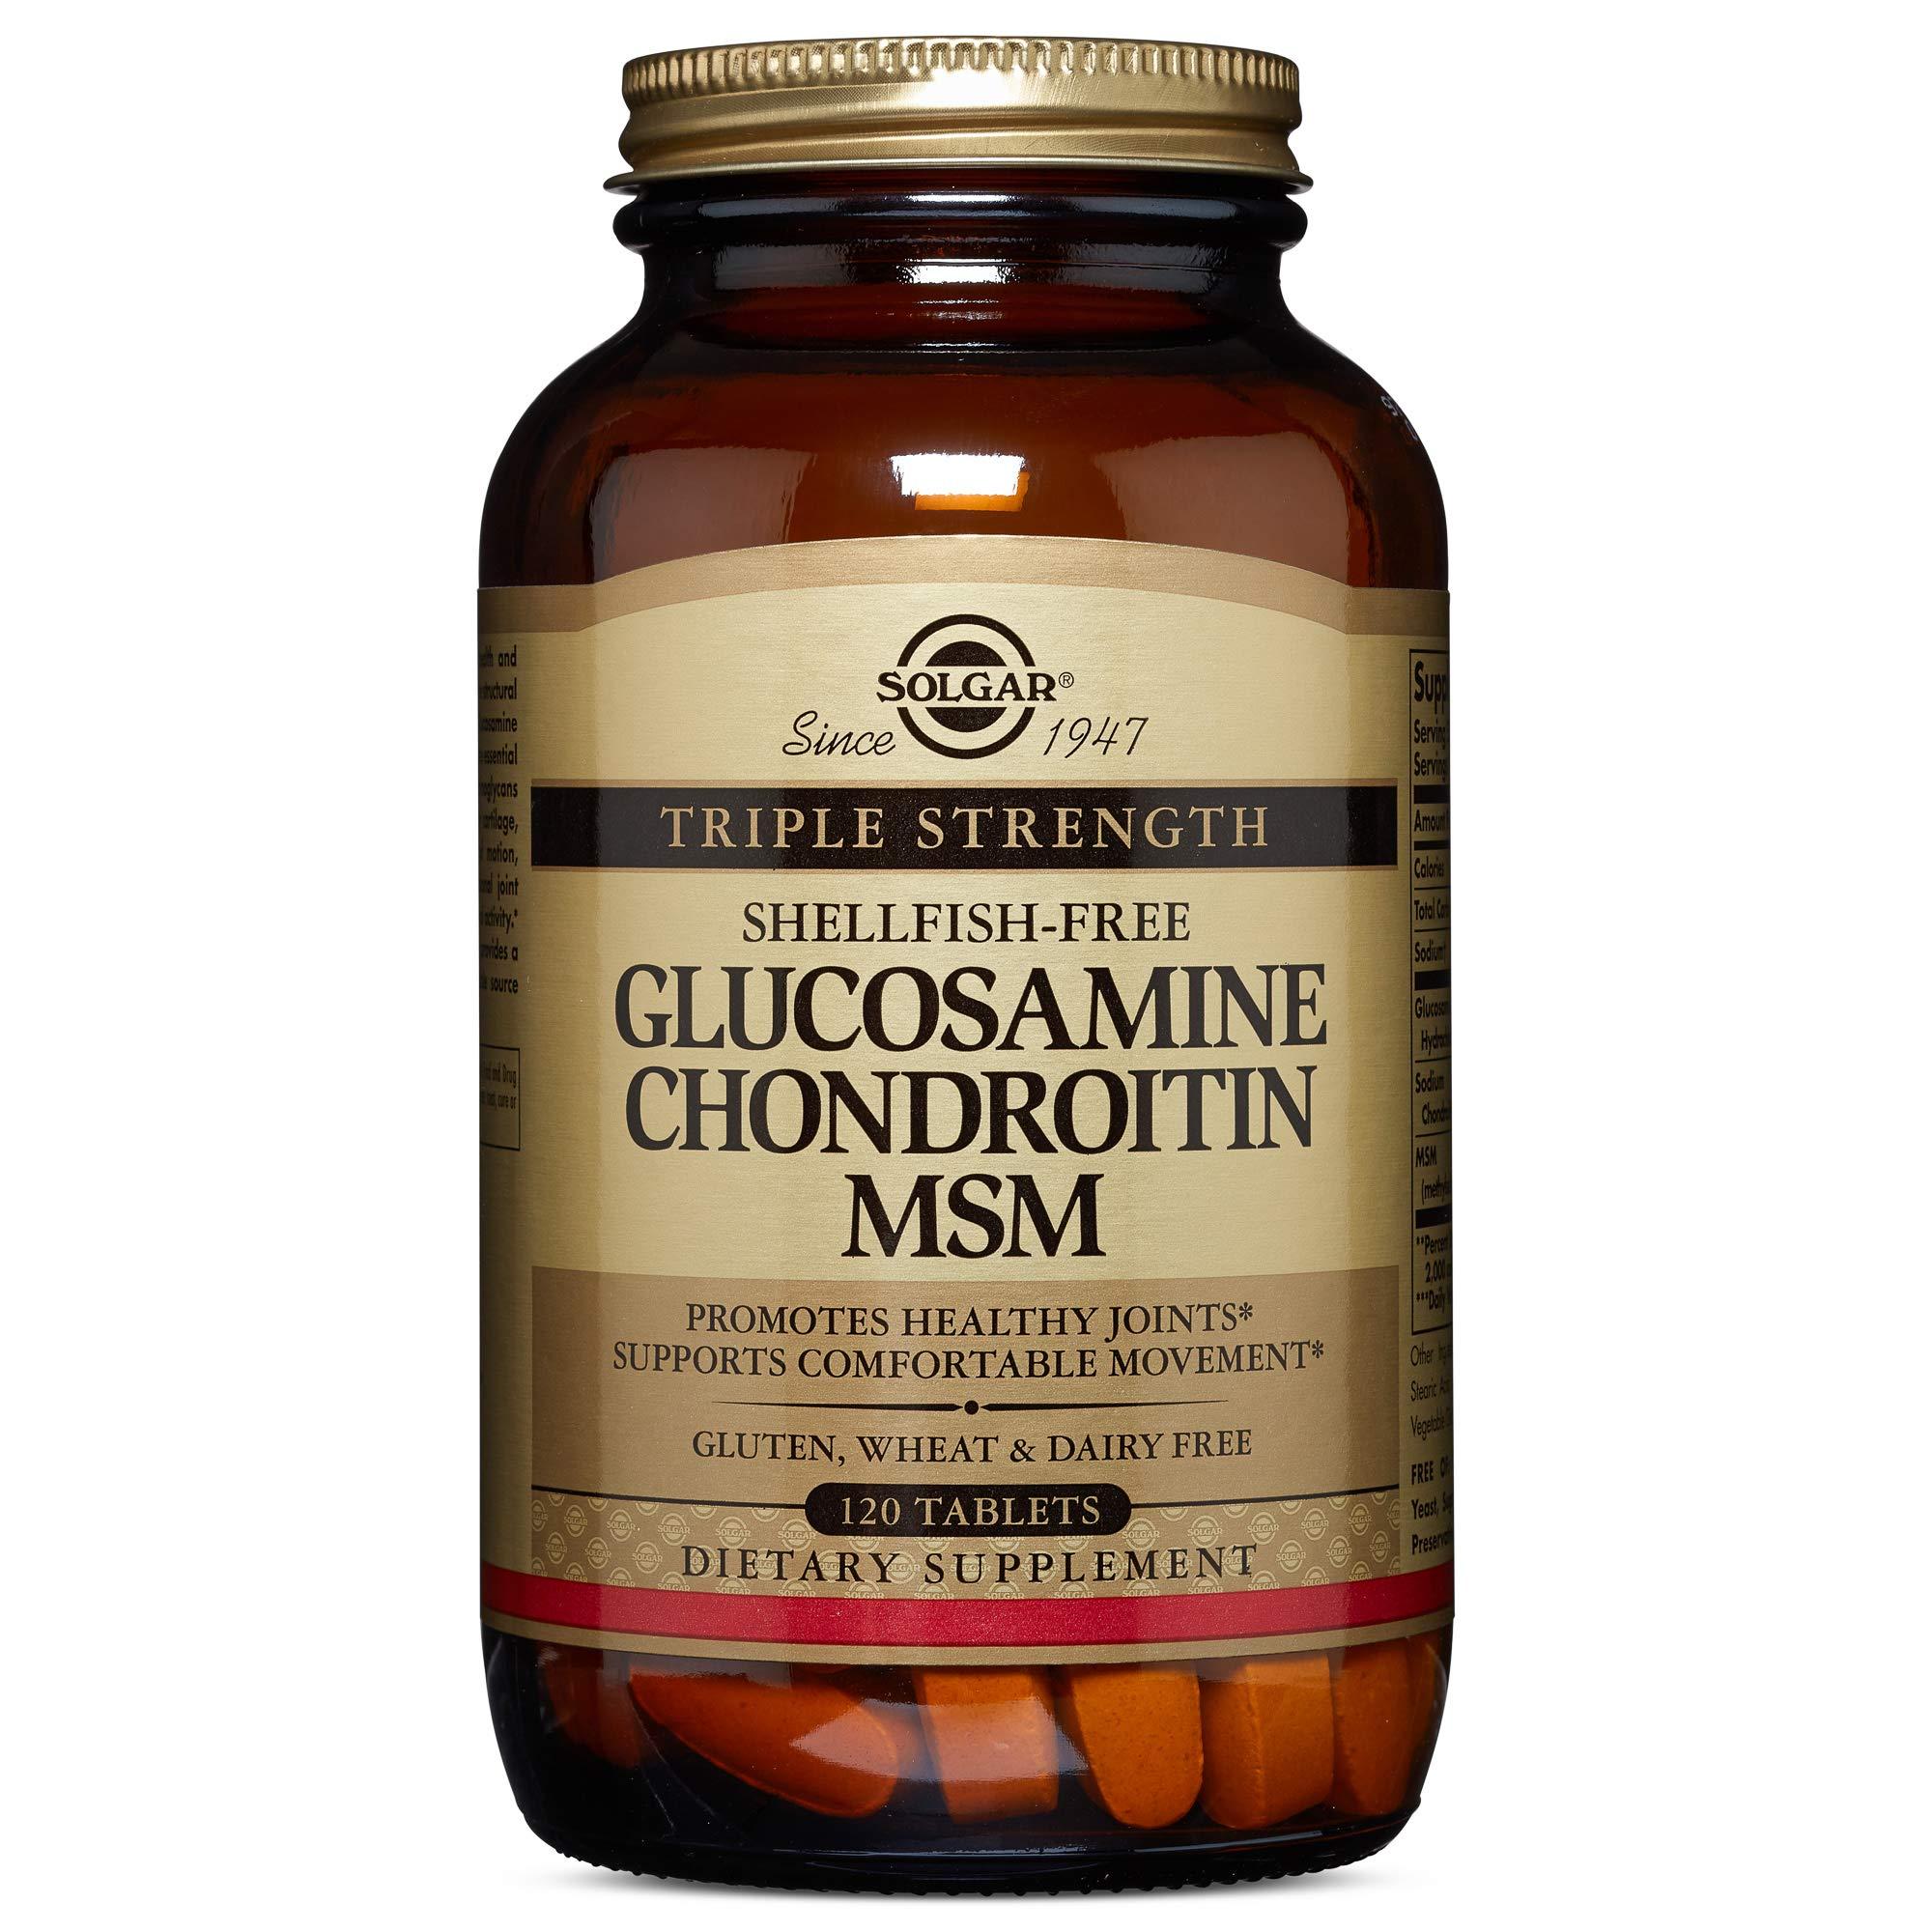 Solgar - Triple Strength Glucosamine Chondroitin MSM (Shellfish-Free) 120 Tablets by Solgar